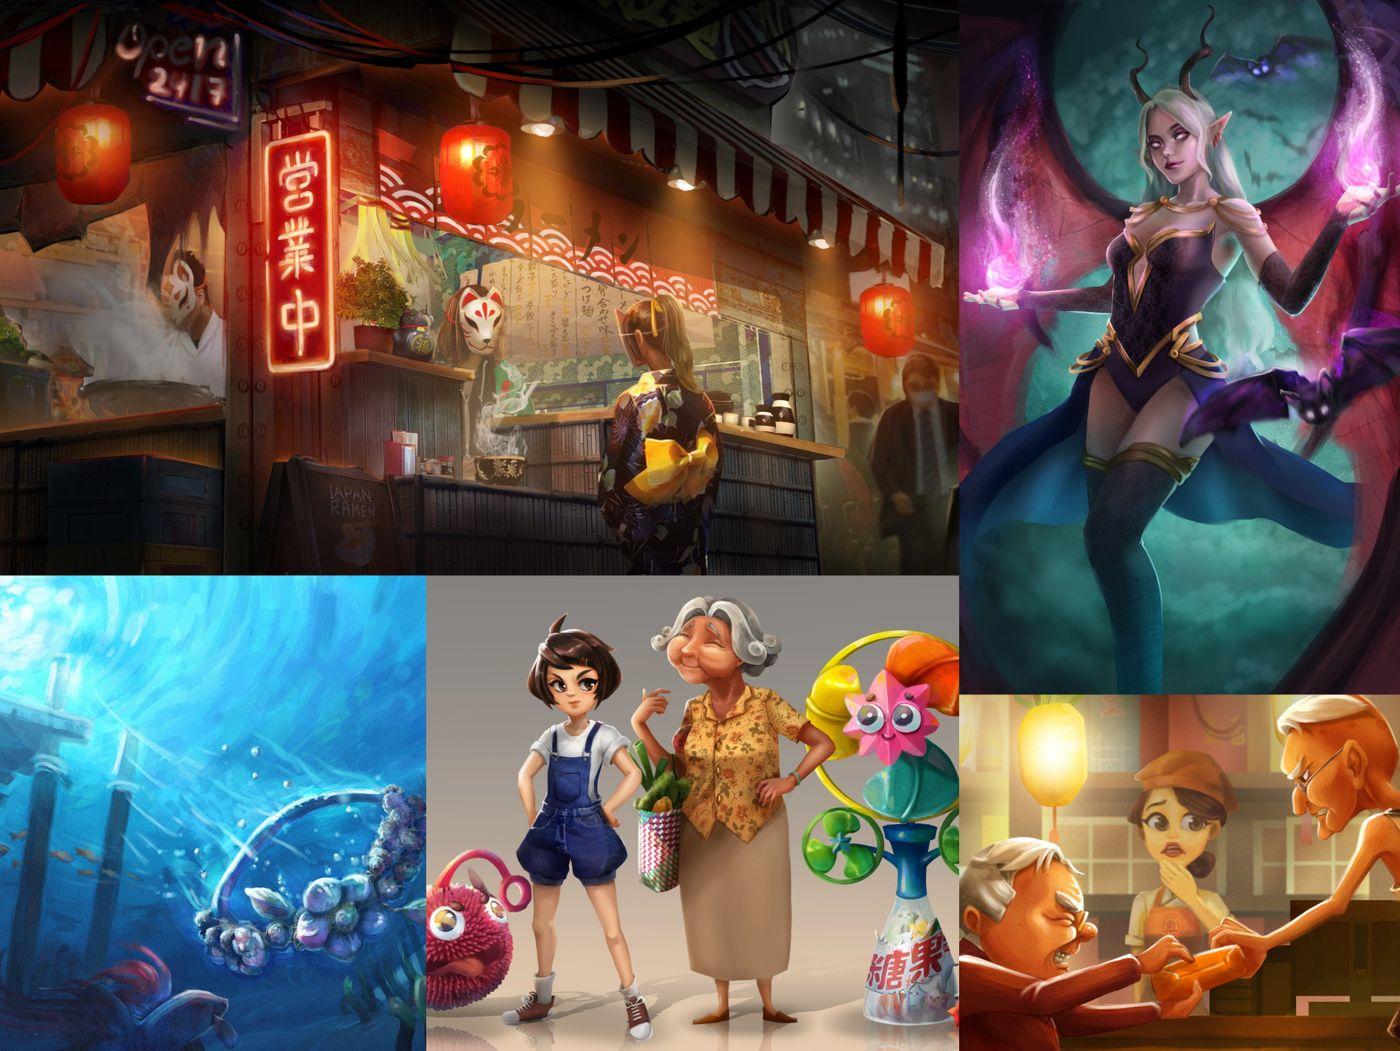 Concept Design, Illustration - Ng Wen Chyi